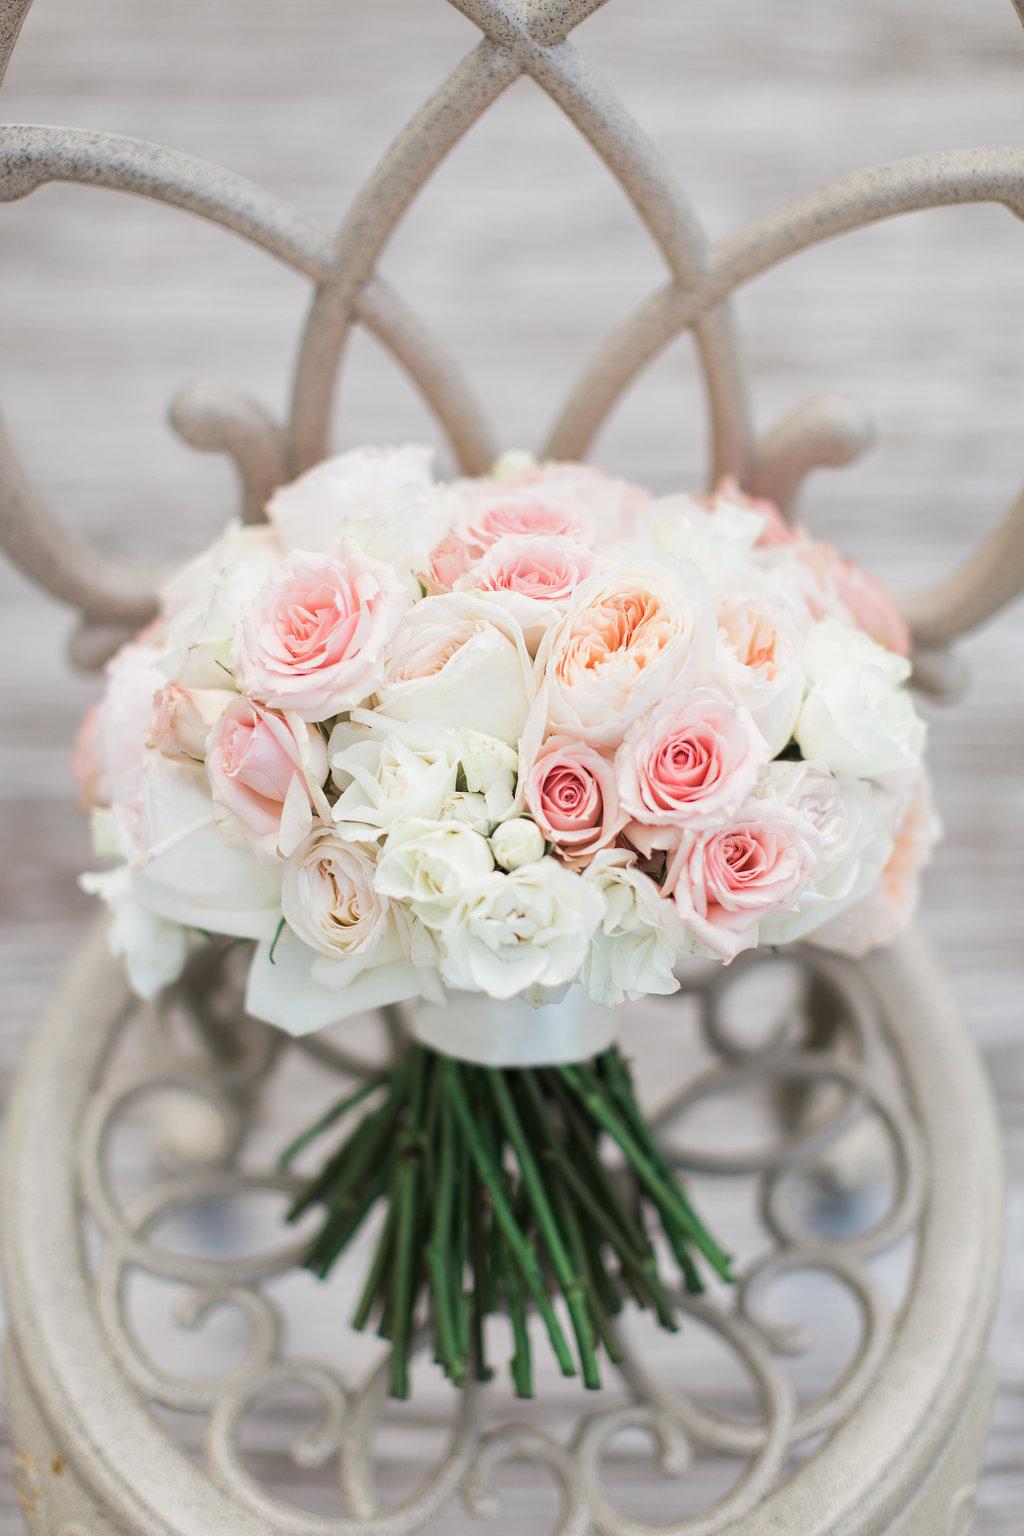 apt-b-photography-ivory-and-beau-bridal-boutique-savannah-florist-savannah-wedding-flowers-savannah-wedding-planner-tybee-island-wedding-chapel-wedding-rose-bouquet-blush-wedding-tybee-wedding-savannah-weddings-savannah-flowers-6.jpg